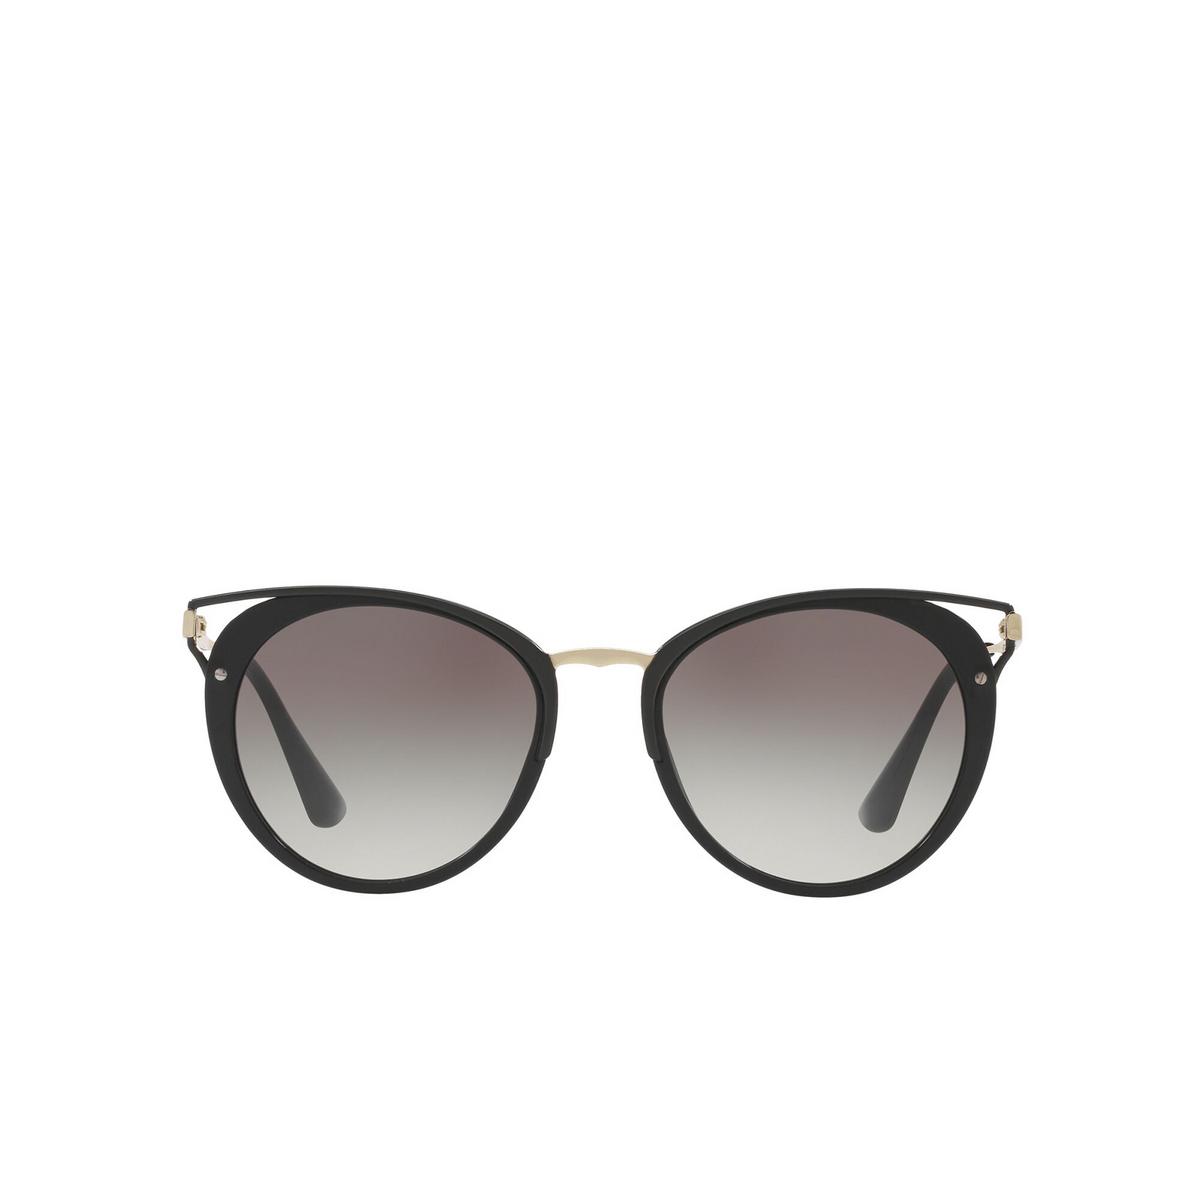 Prada® Cat-eye Sunglasses: PR 66TS color Black 1AB0A7 - front view.